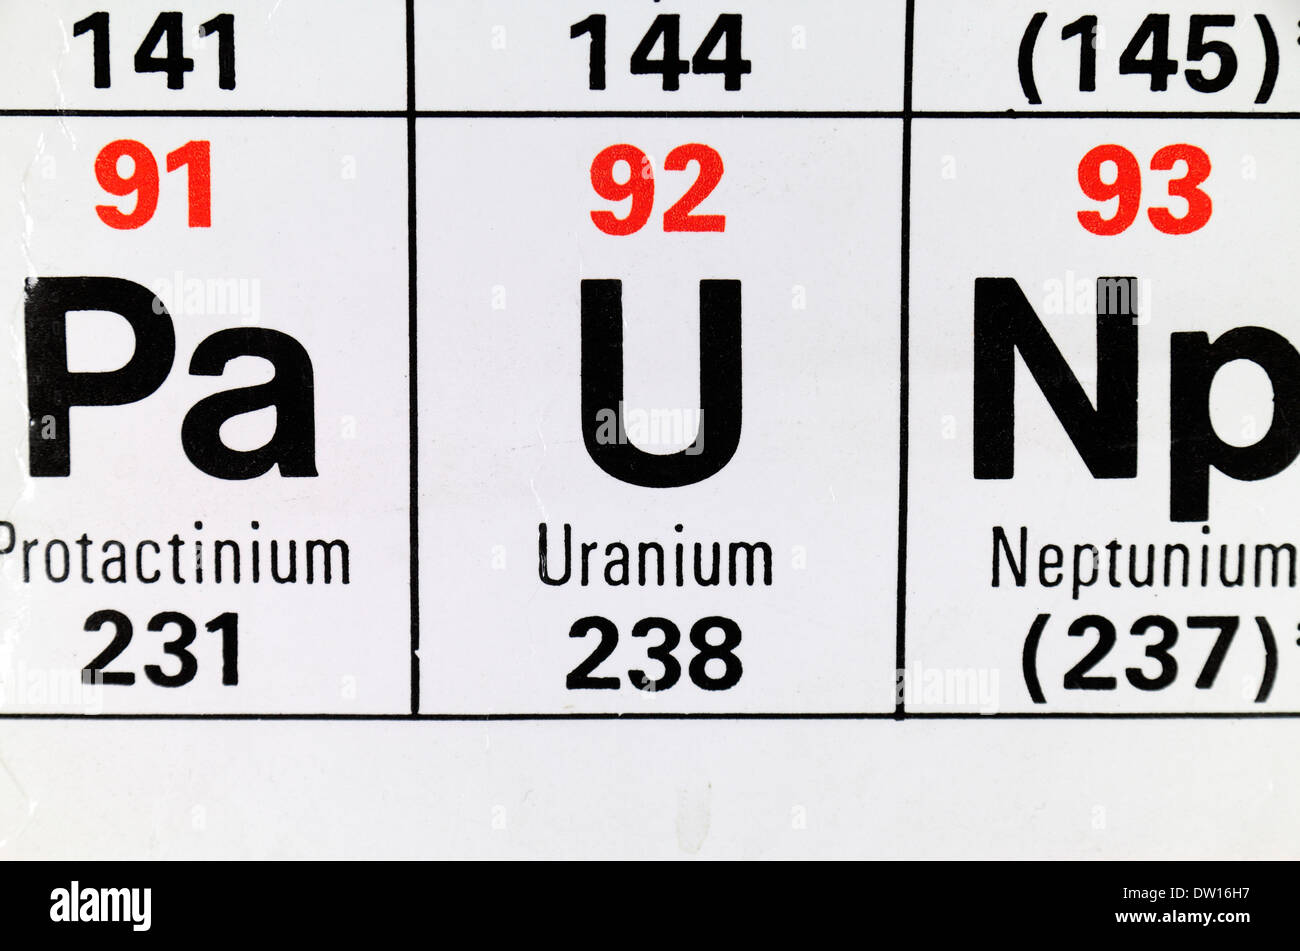 Uranio u como aparece en la tabla peridica foto imagen de uranio u como aparece en la tabla peridica urtaz Images